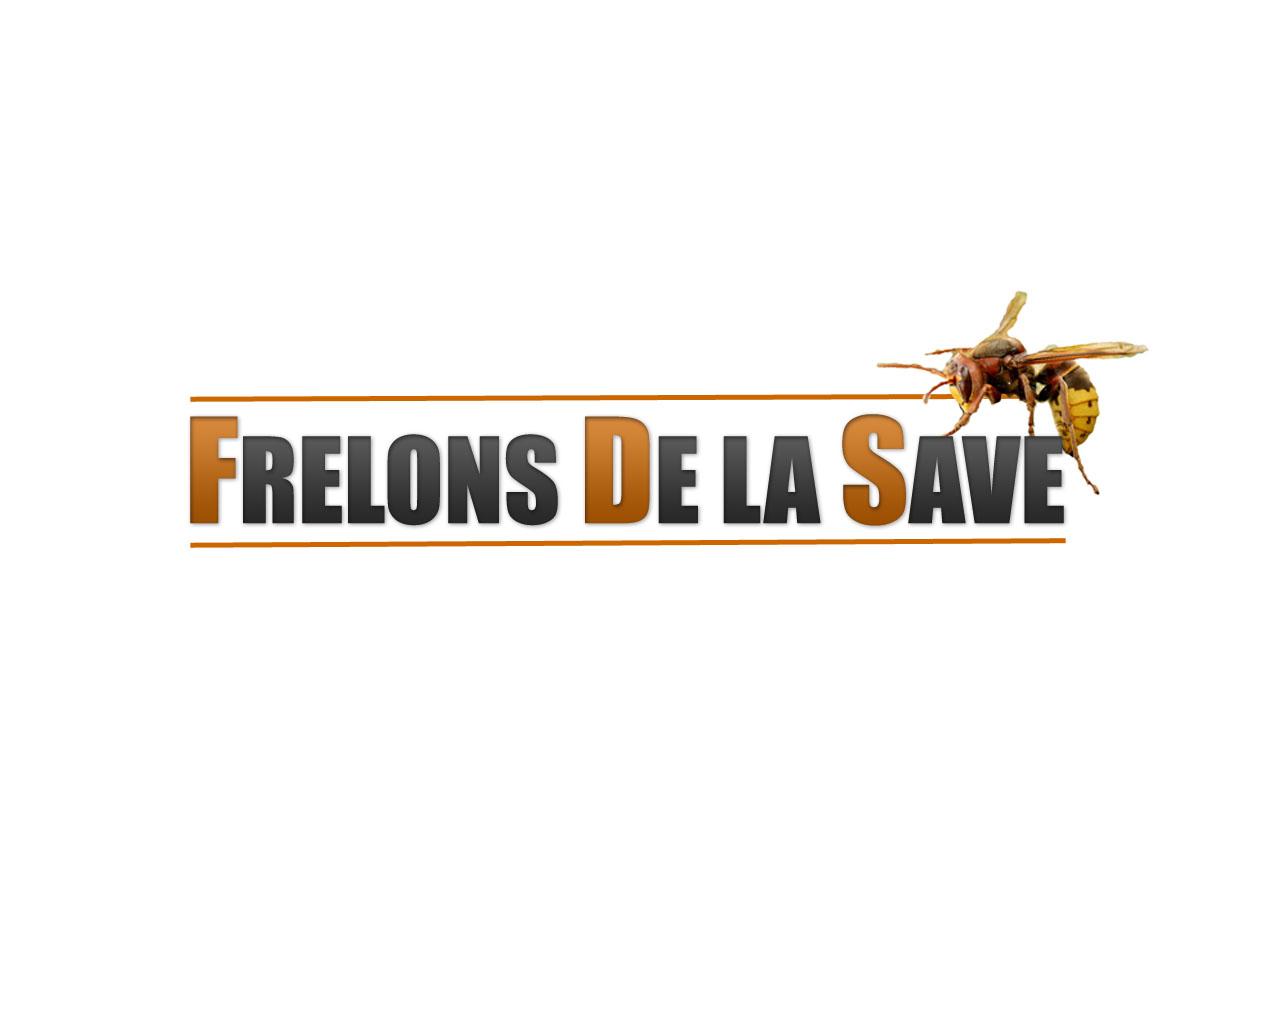 FRELONS DE LA SAVE